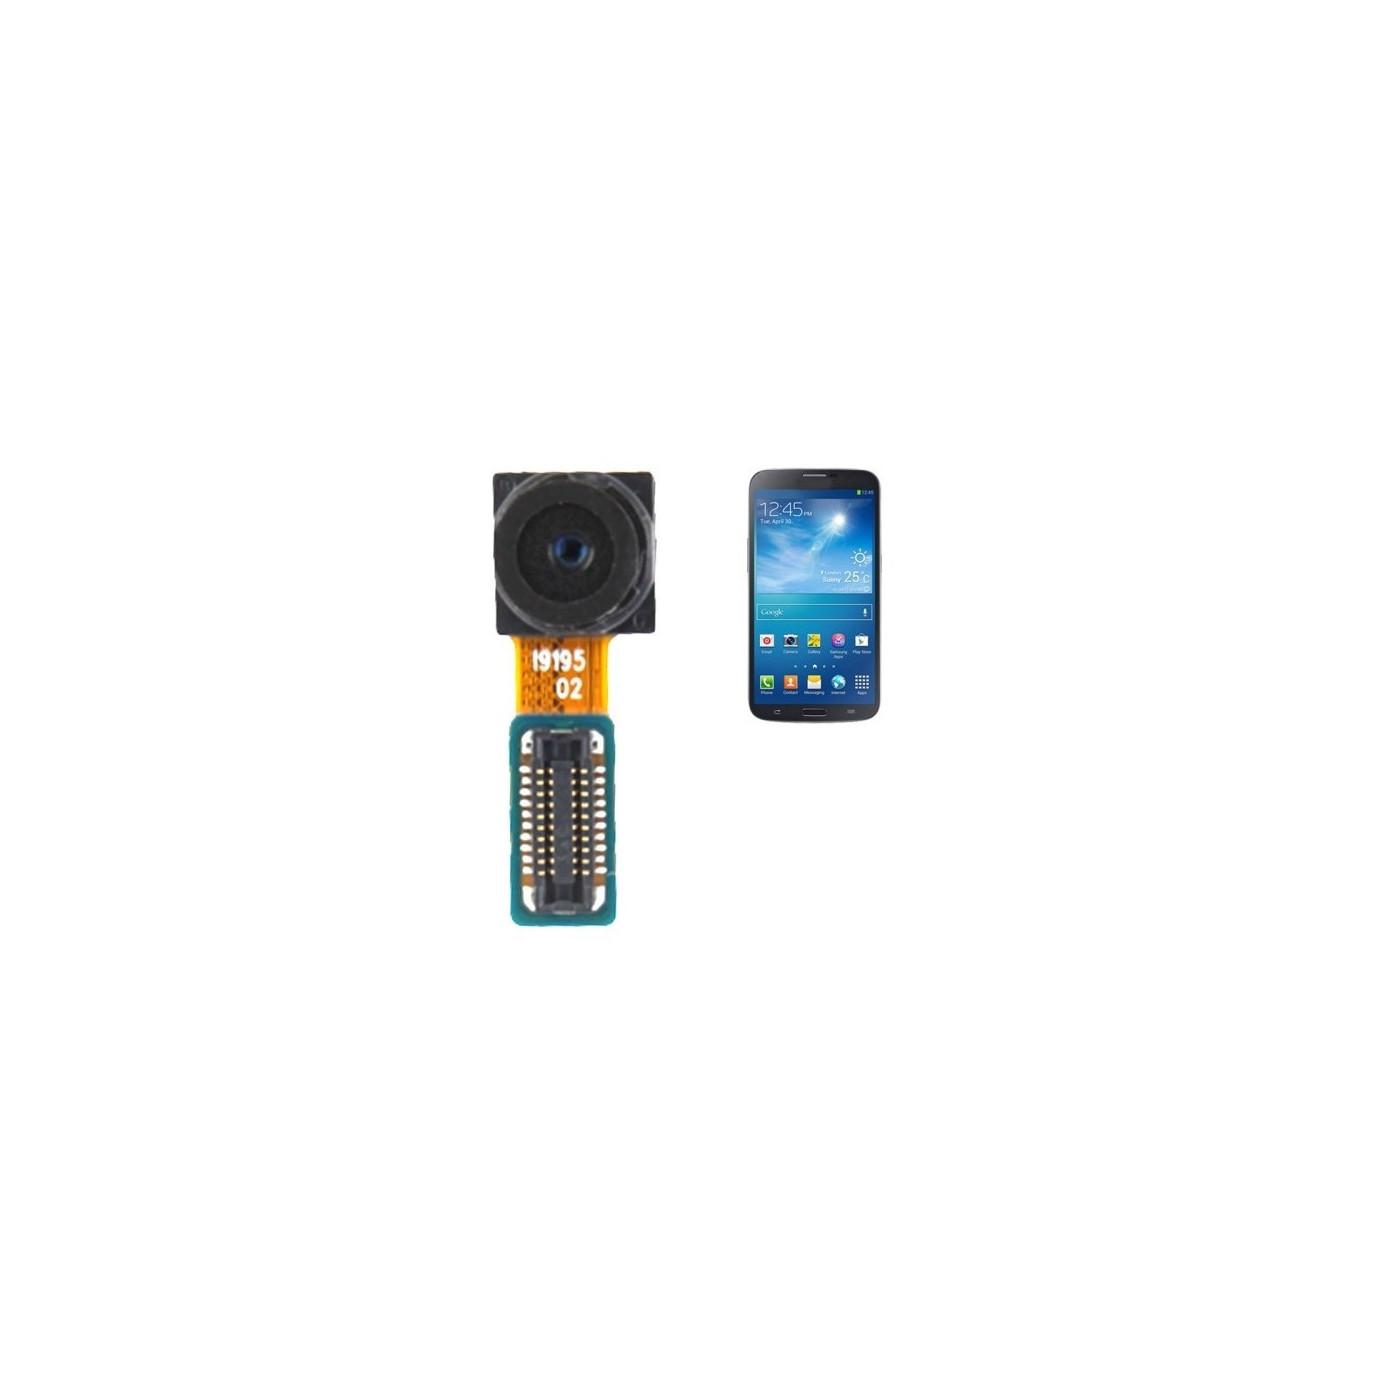 Caméra avant pour Galaxy S4 Mini i9190